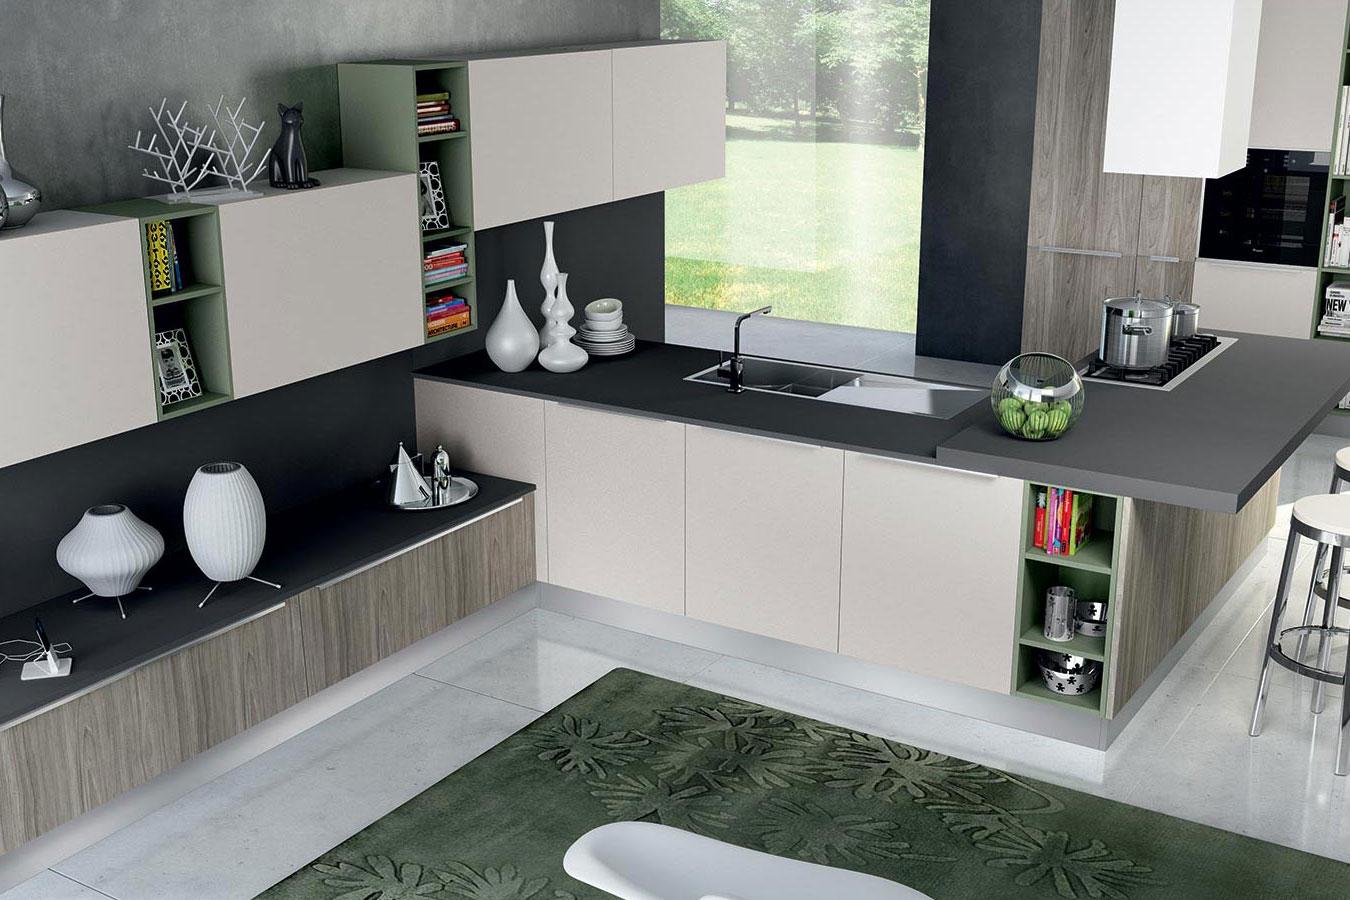 Arredo3-Cucina-Moon-Duna-1-moderna-design-componibile-angolo-cottura ...